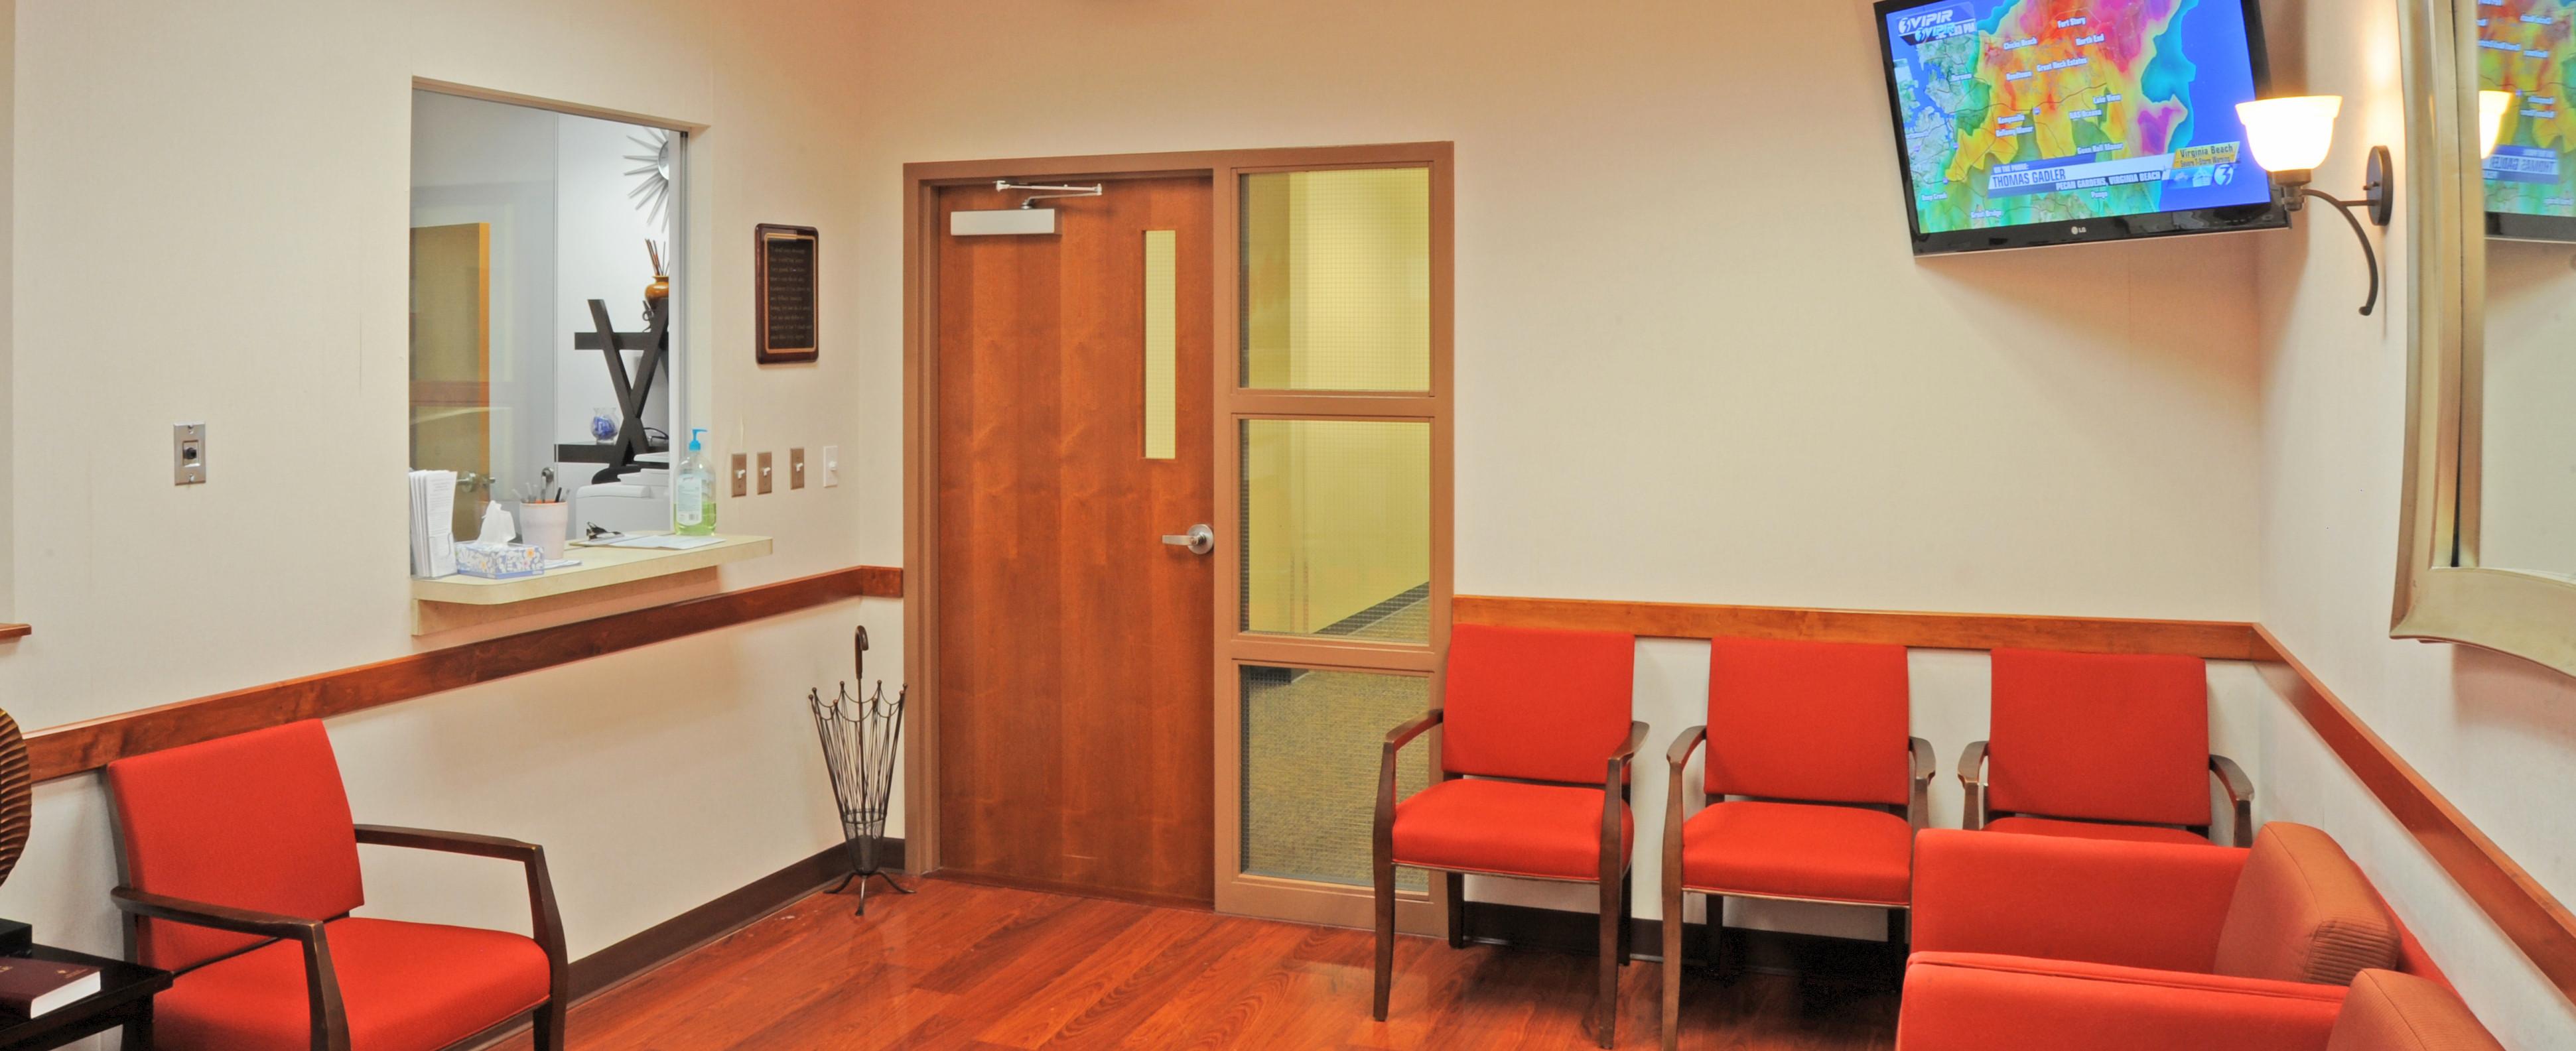 Virginia Dermatology Center Skin Cancer Center Llc Cw Brinkley